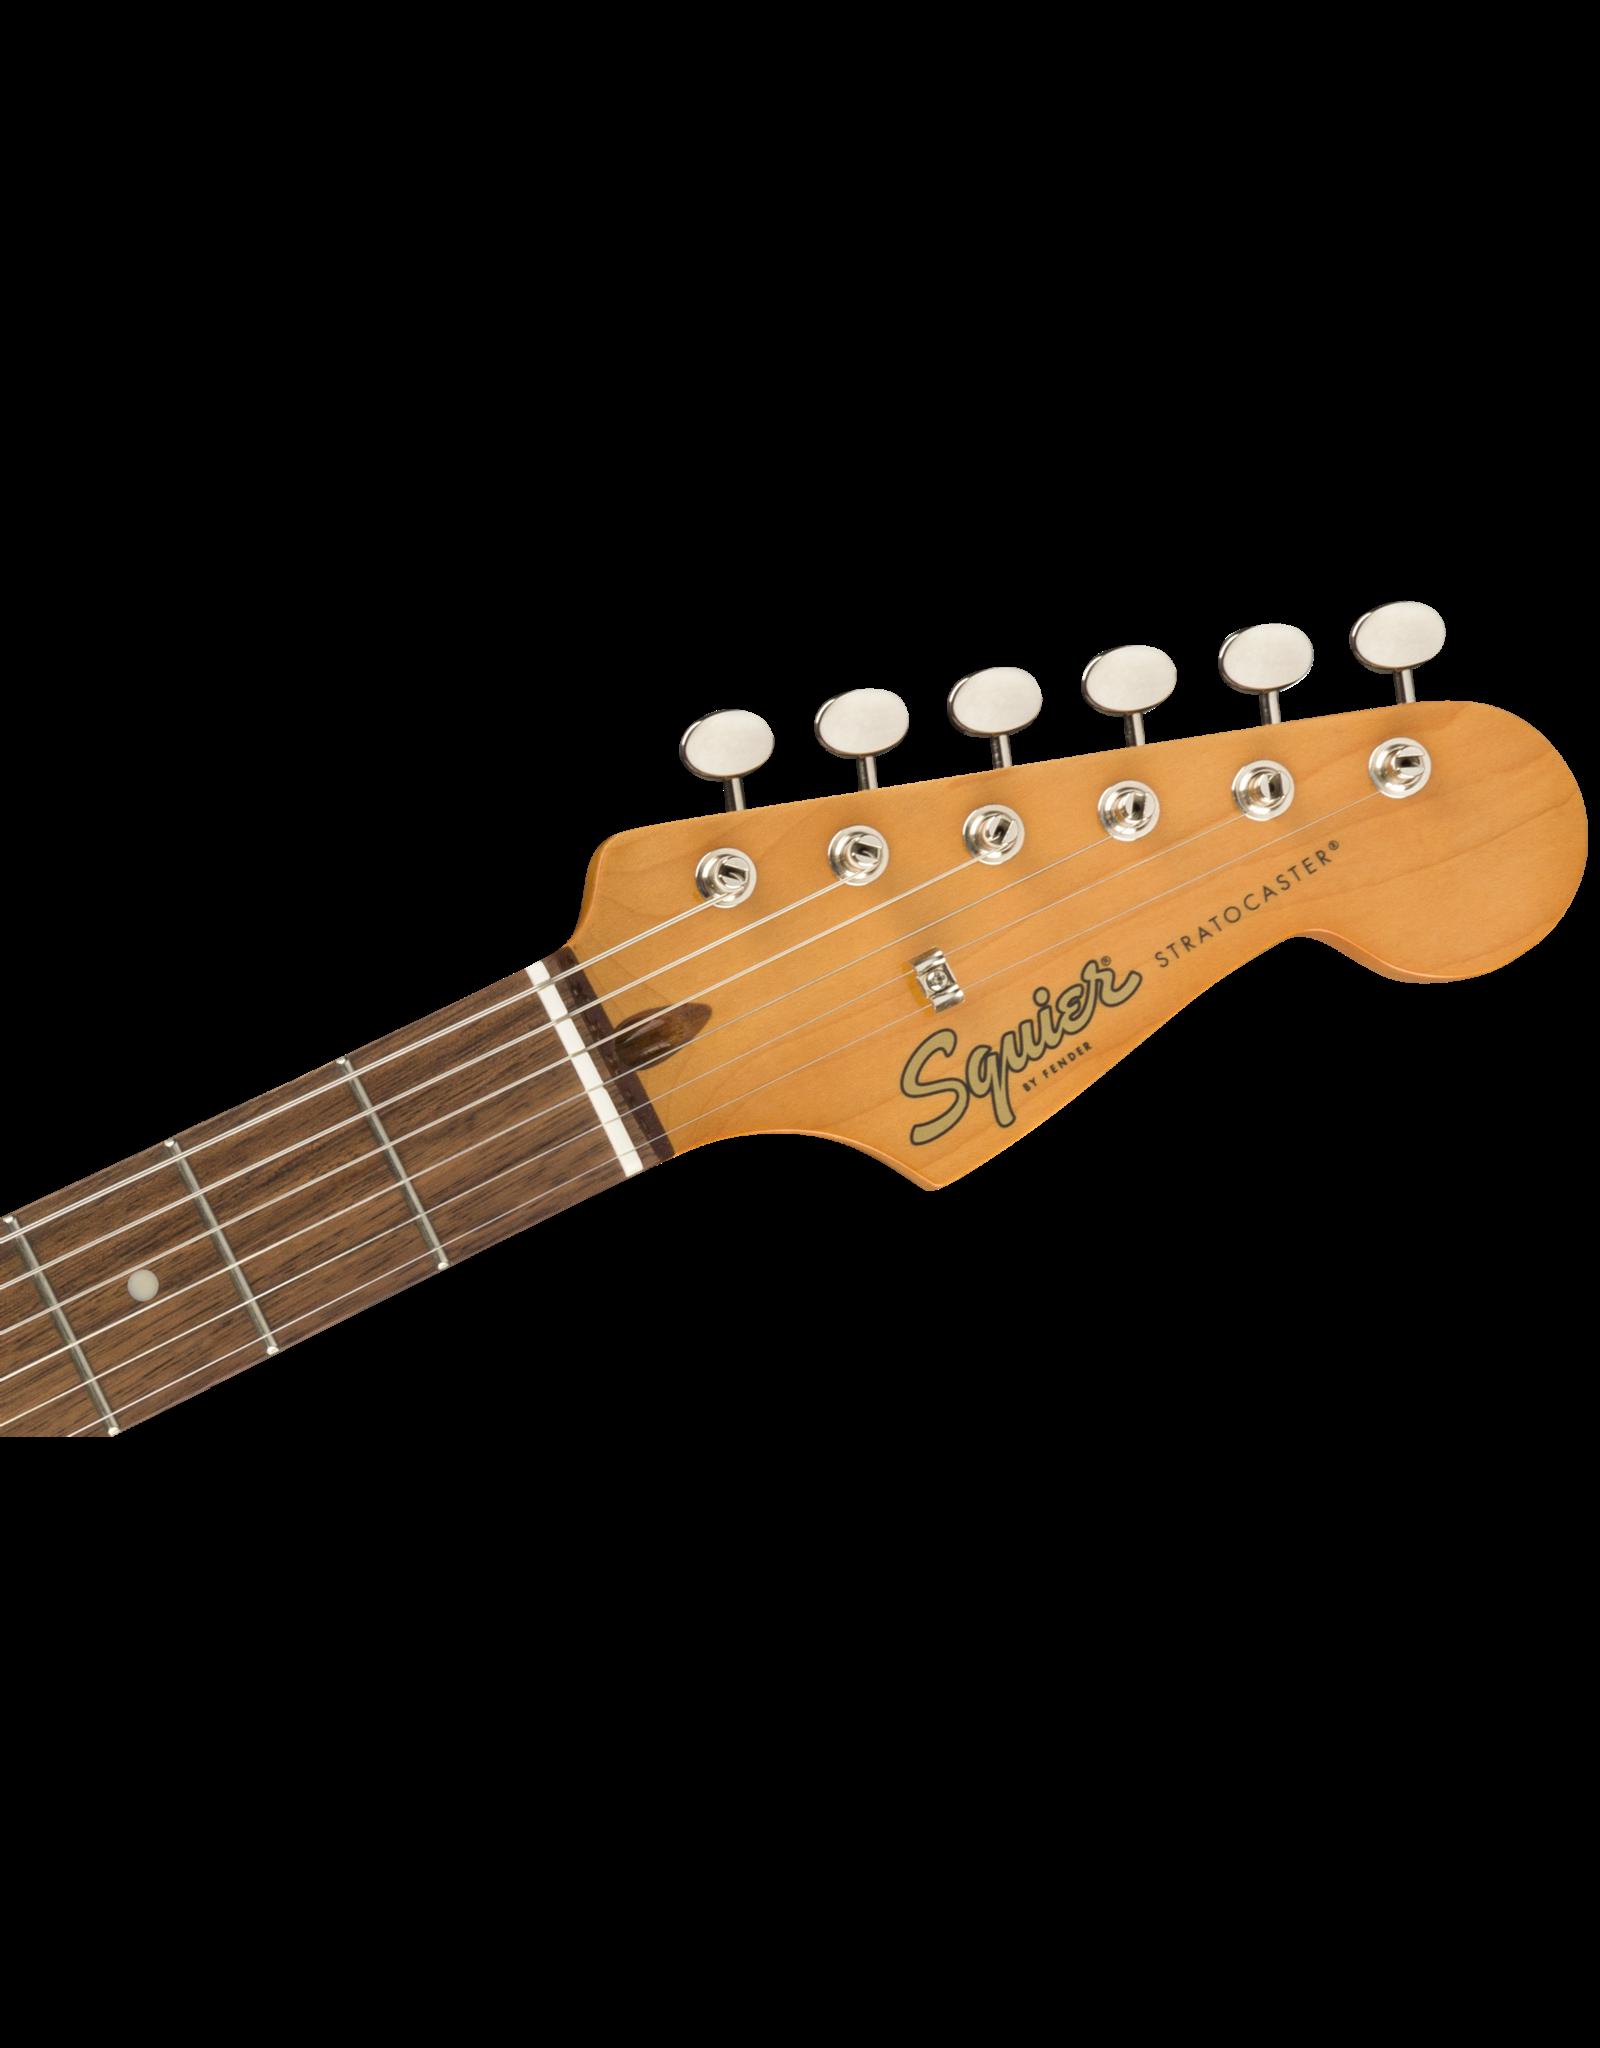 Fender Squier Classic Vibe '60s Stratocaster  3 tone sunburst